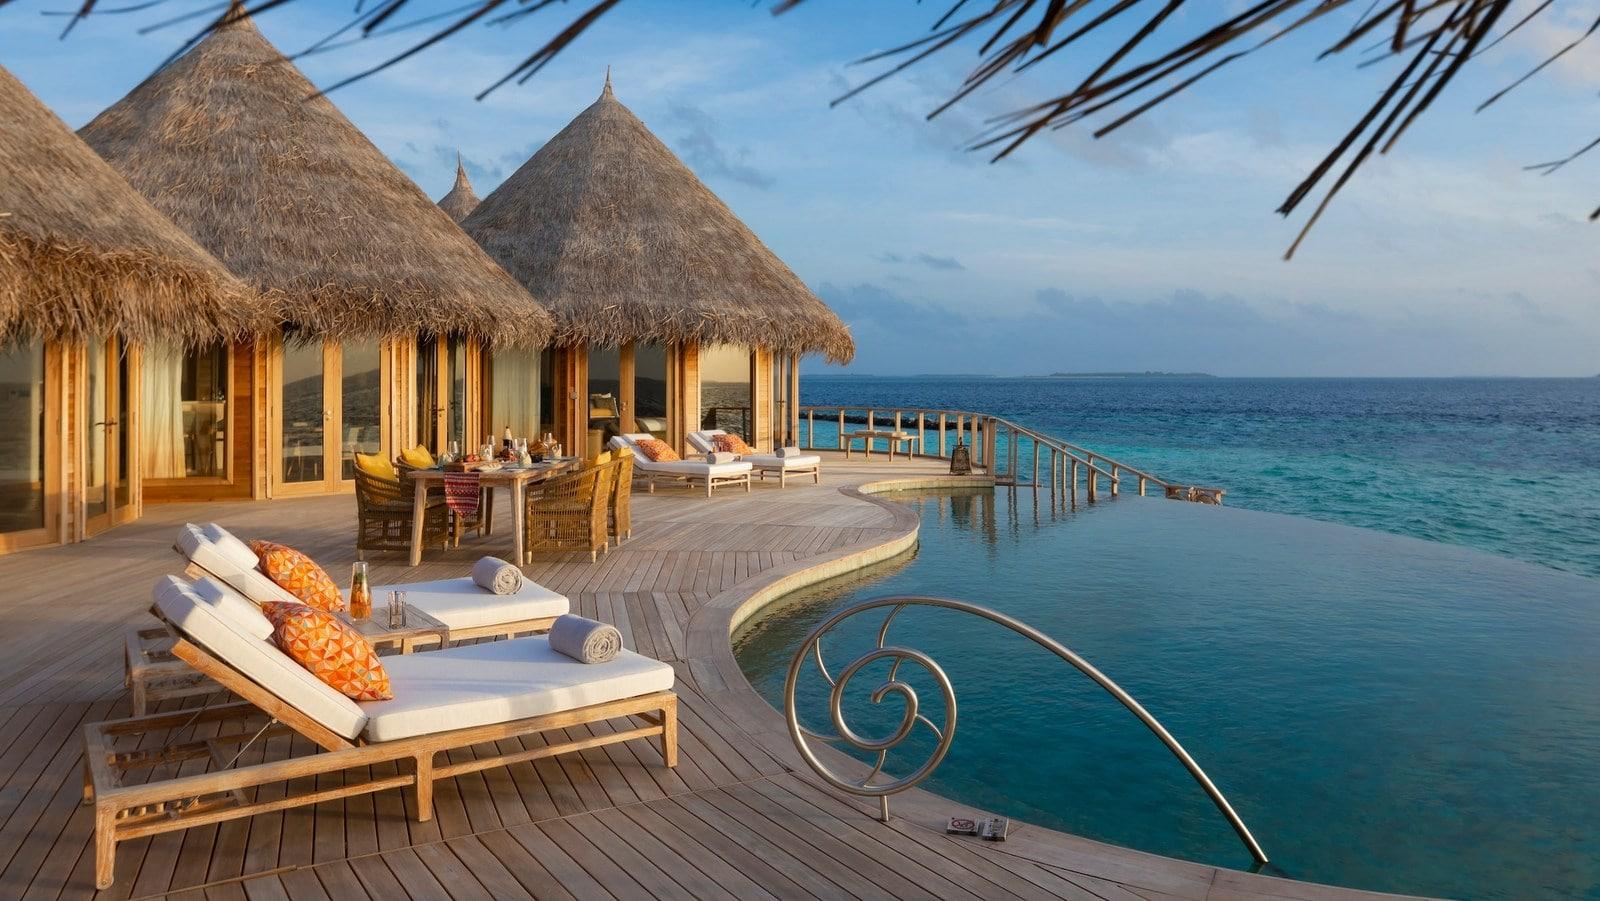 Мальдивы, отель The Nautilus Maldives, номер Two-Bedroom The Nautilus Retreat